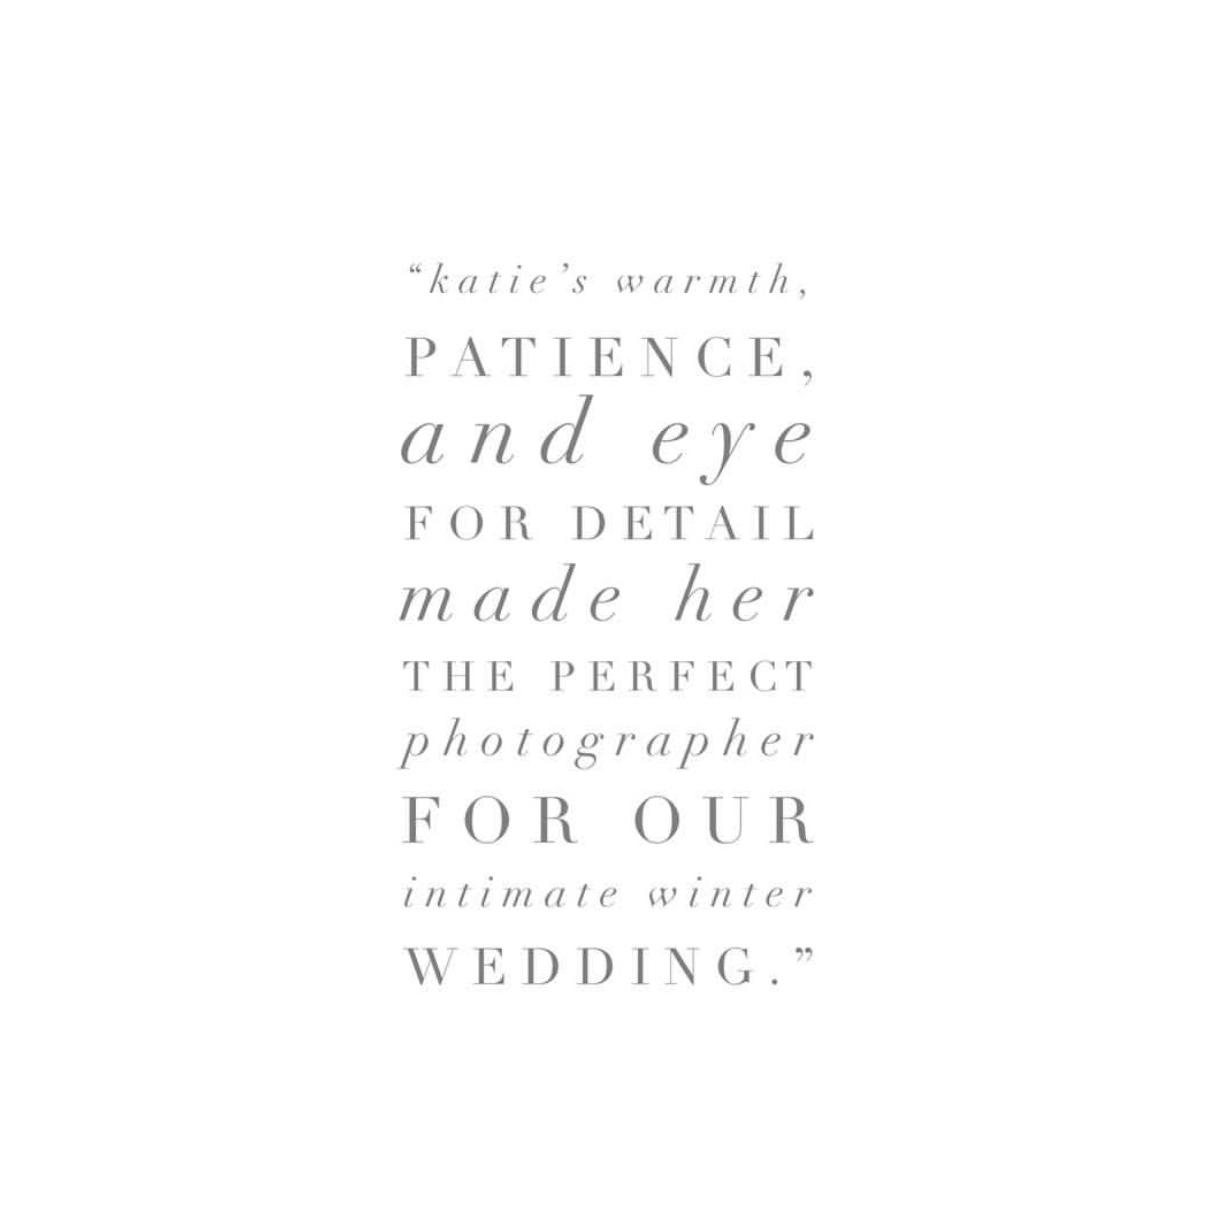 IMG_4069.PNGkatie_graham_photography_wedding_destination_photographer_friday_roundup_katiegrahamphoto_instagram